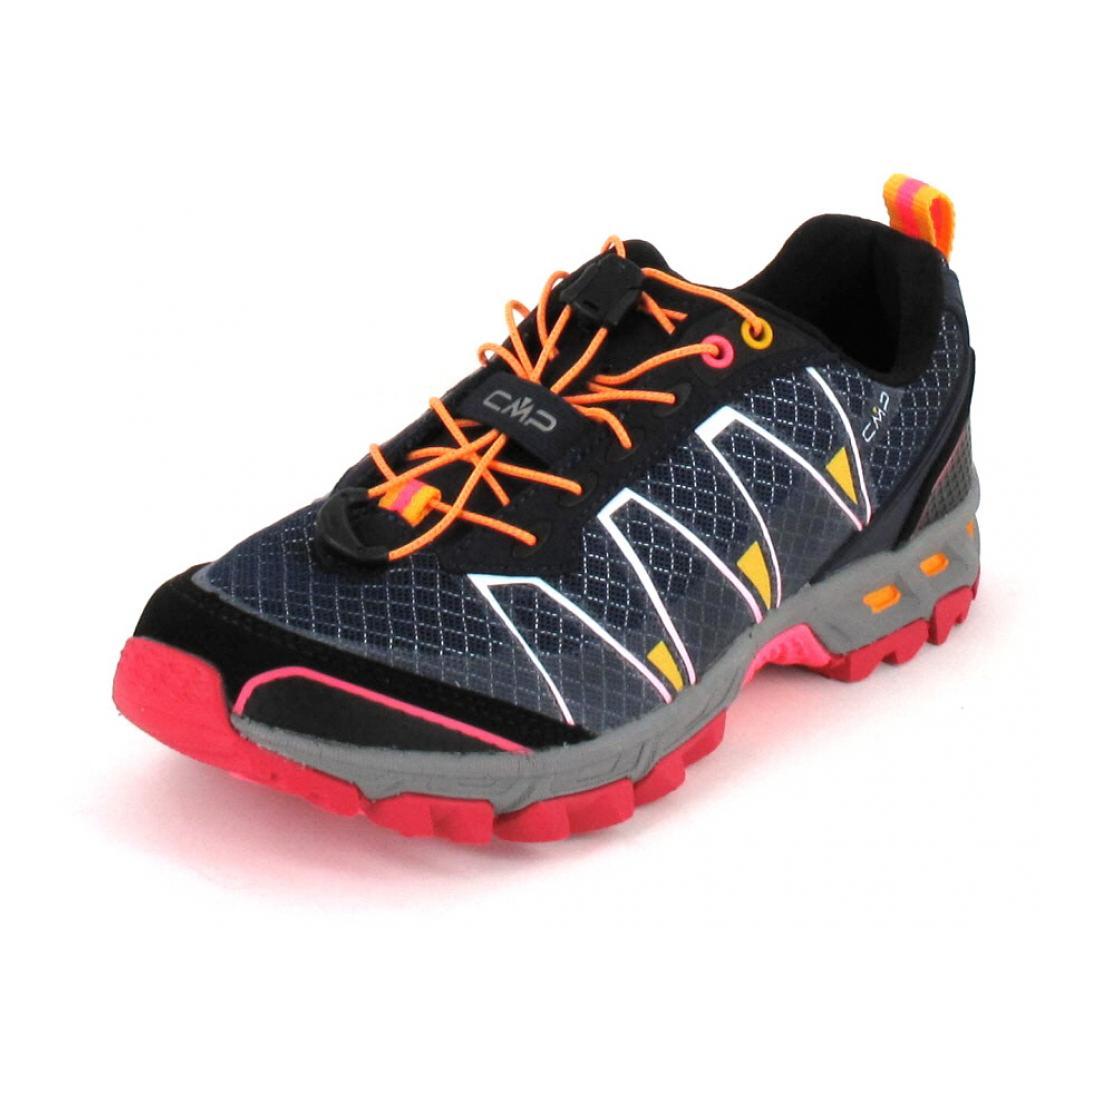 CMP Trekkingschuh Altak WMN Trail Shoe